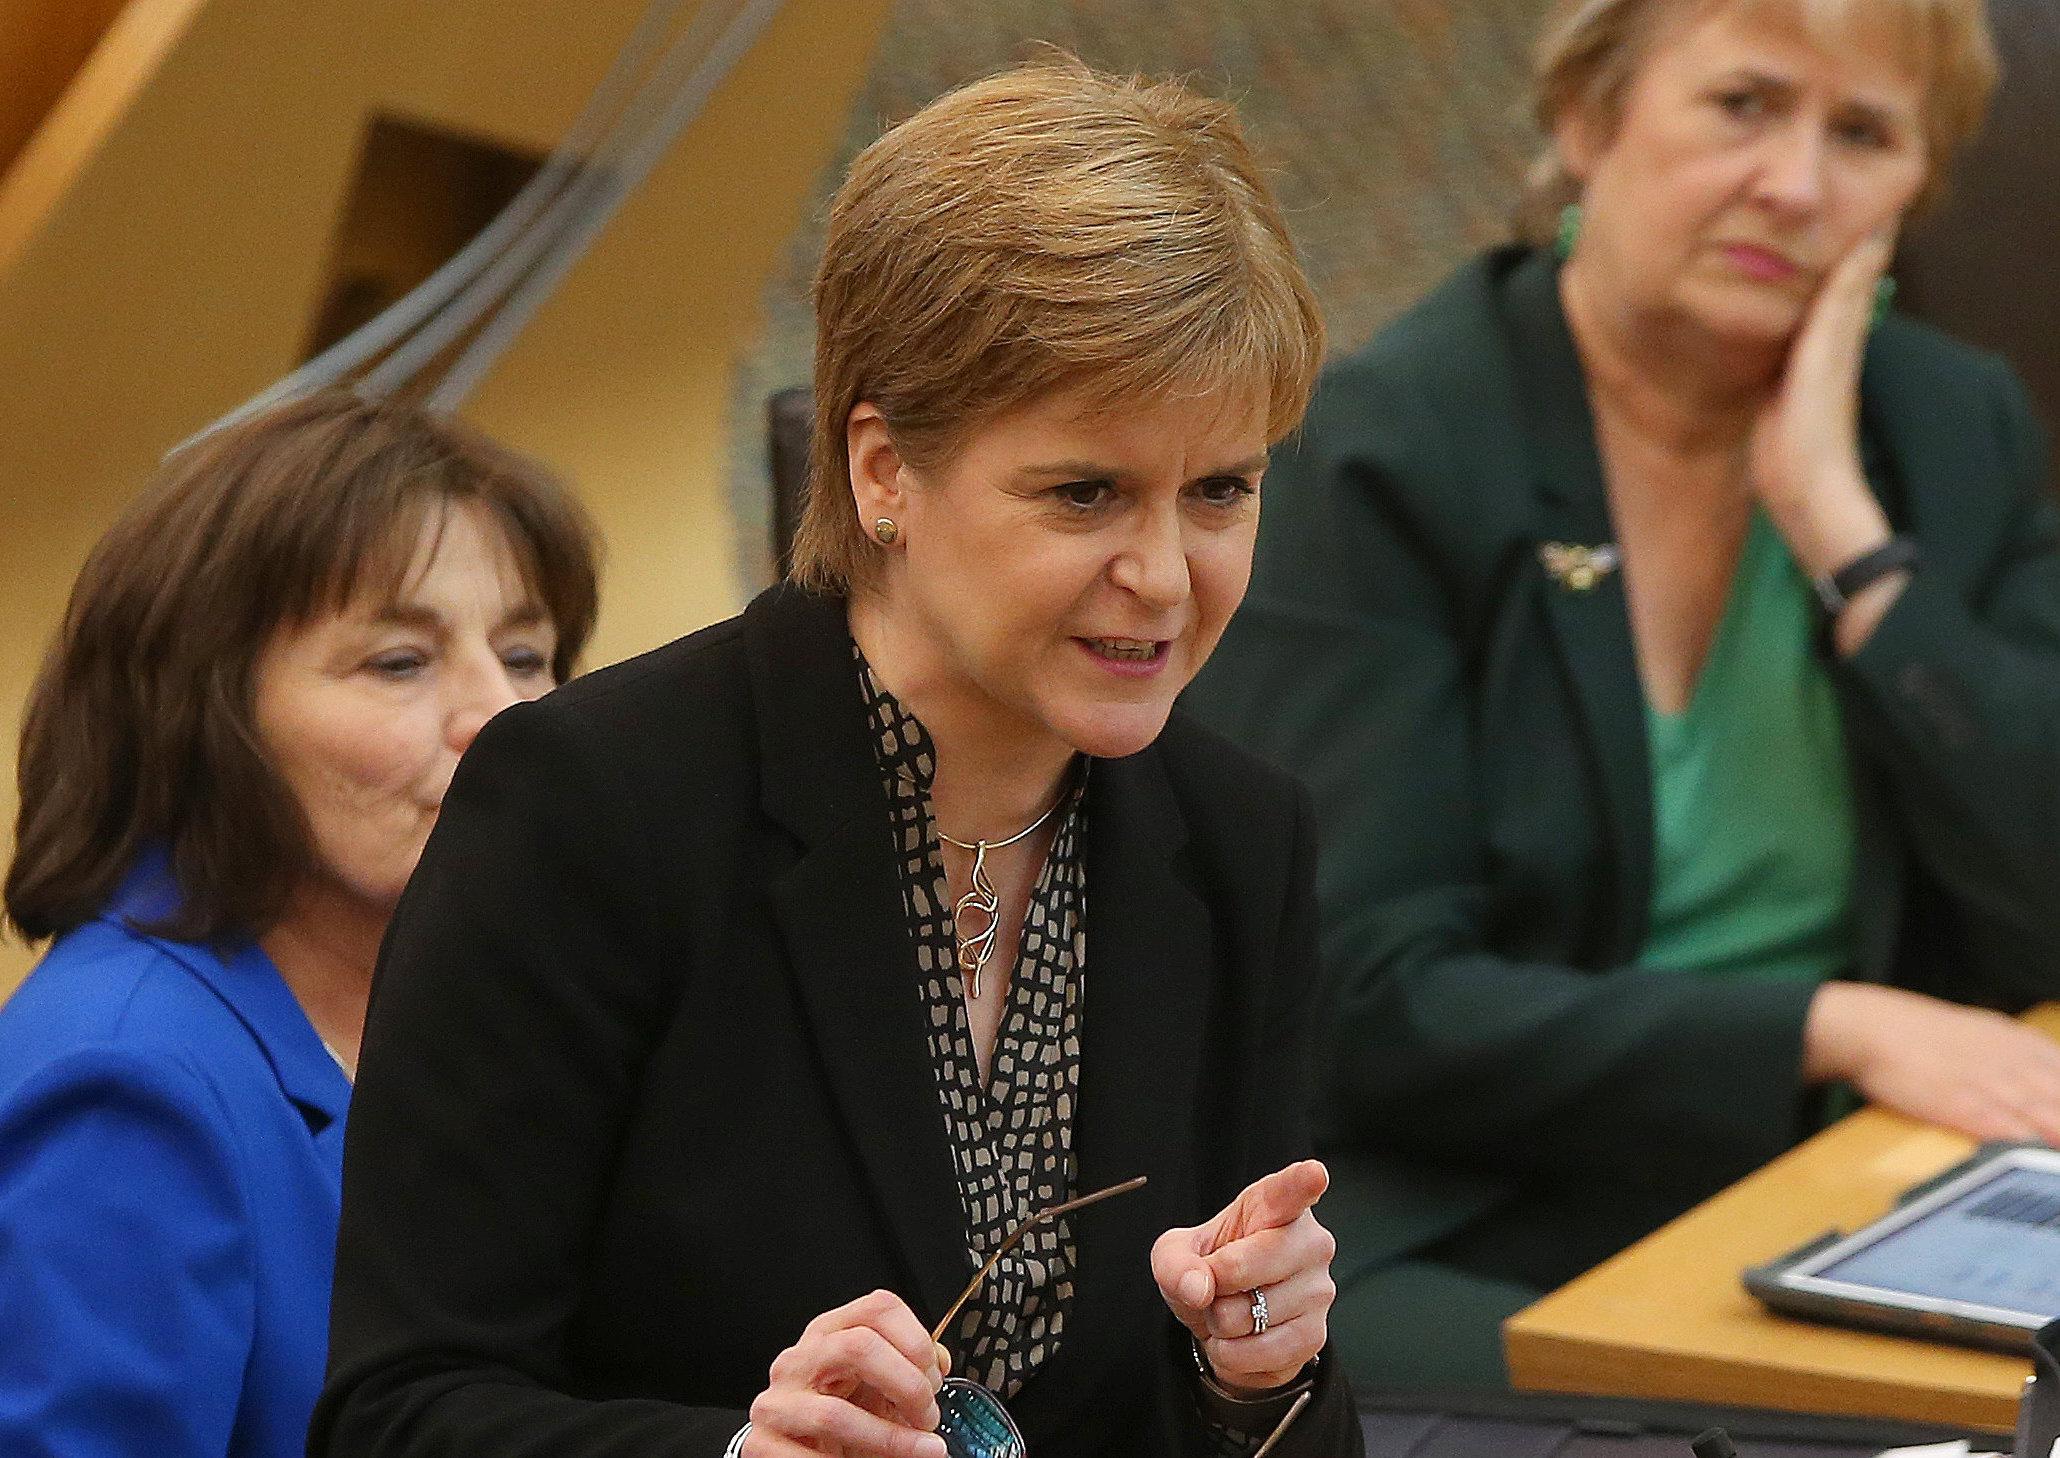 Sturgeon raises fears over Unionists' bid to 'rig' indyref2 plans